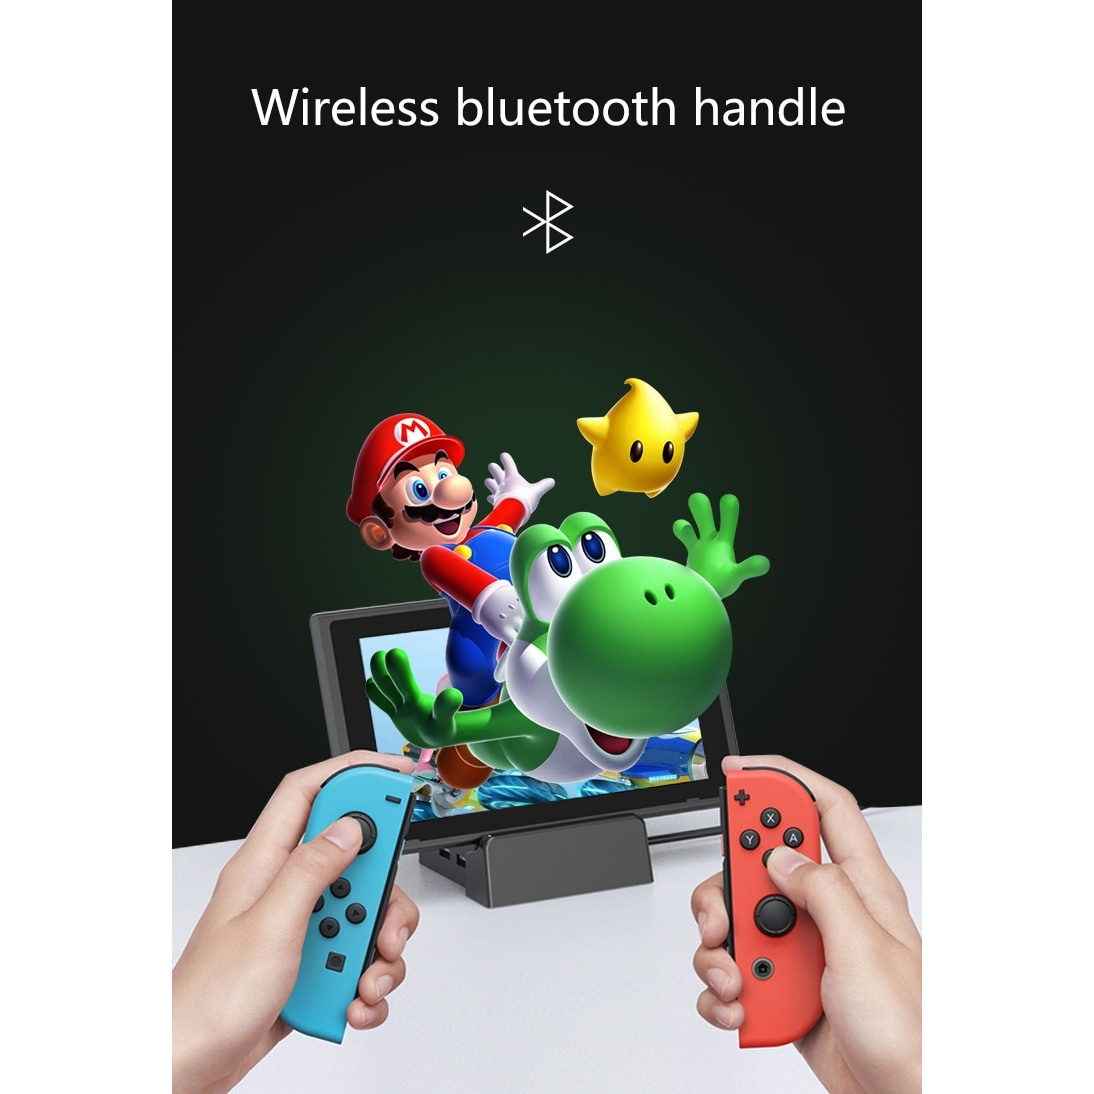 Wireless Joysticks for Nintendo Switch (L and R) Blue - 5